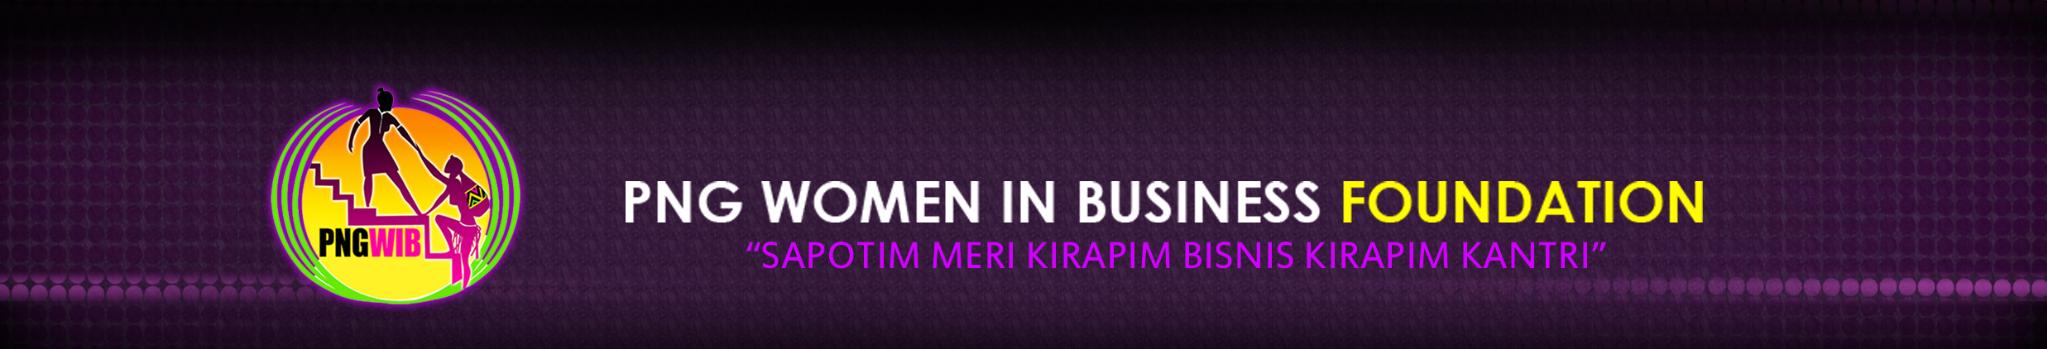 PNG Women in Business Women's Micro Bank.